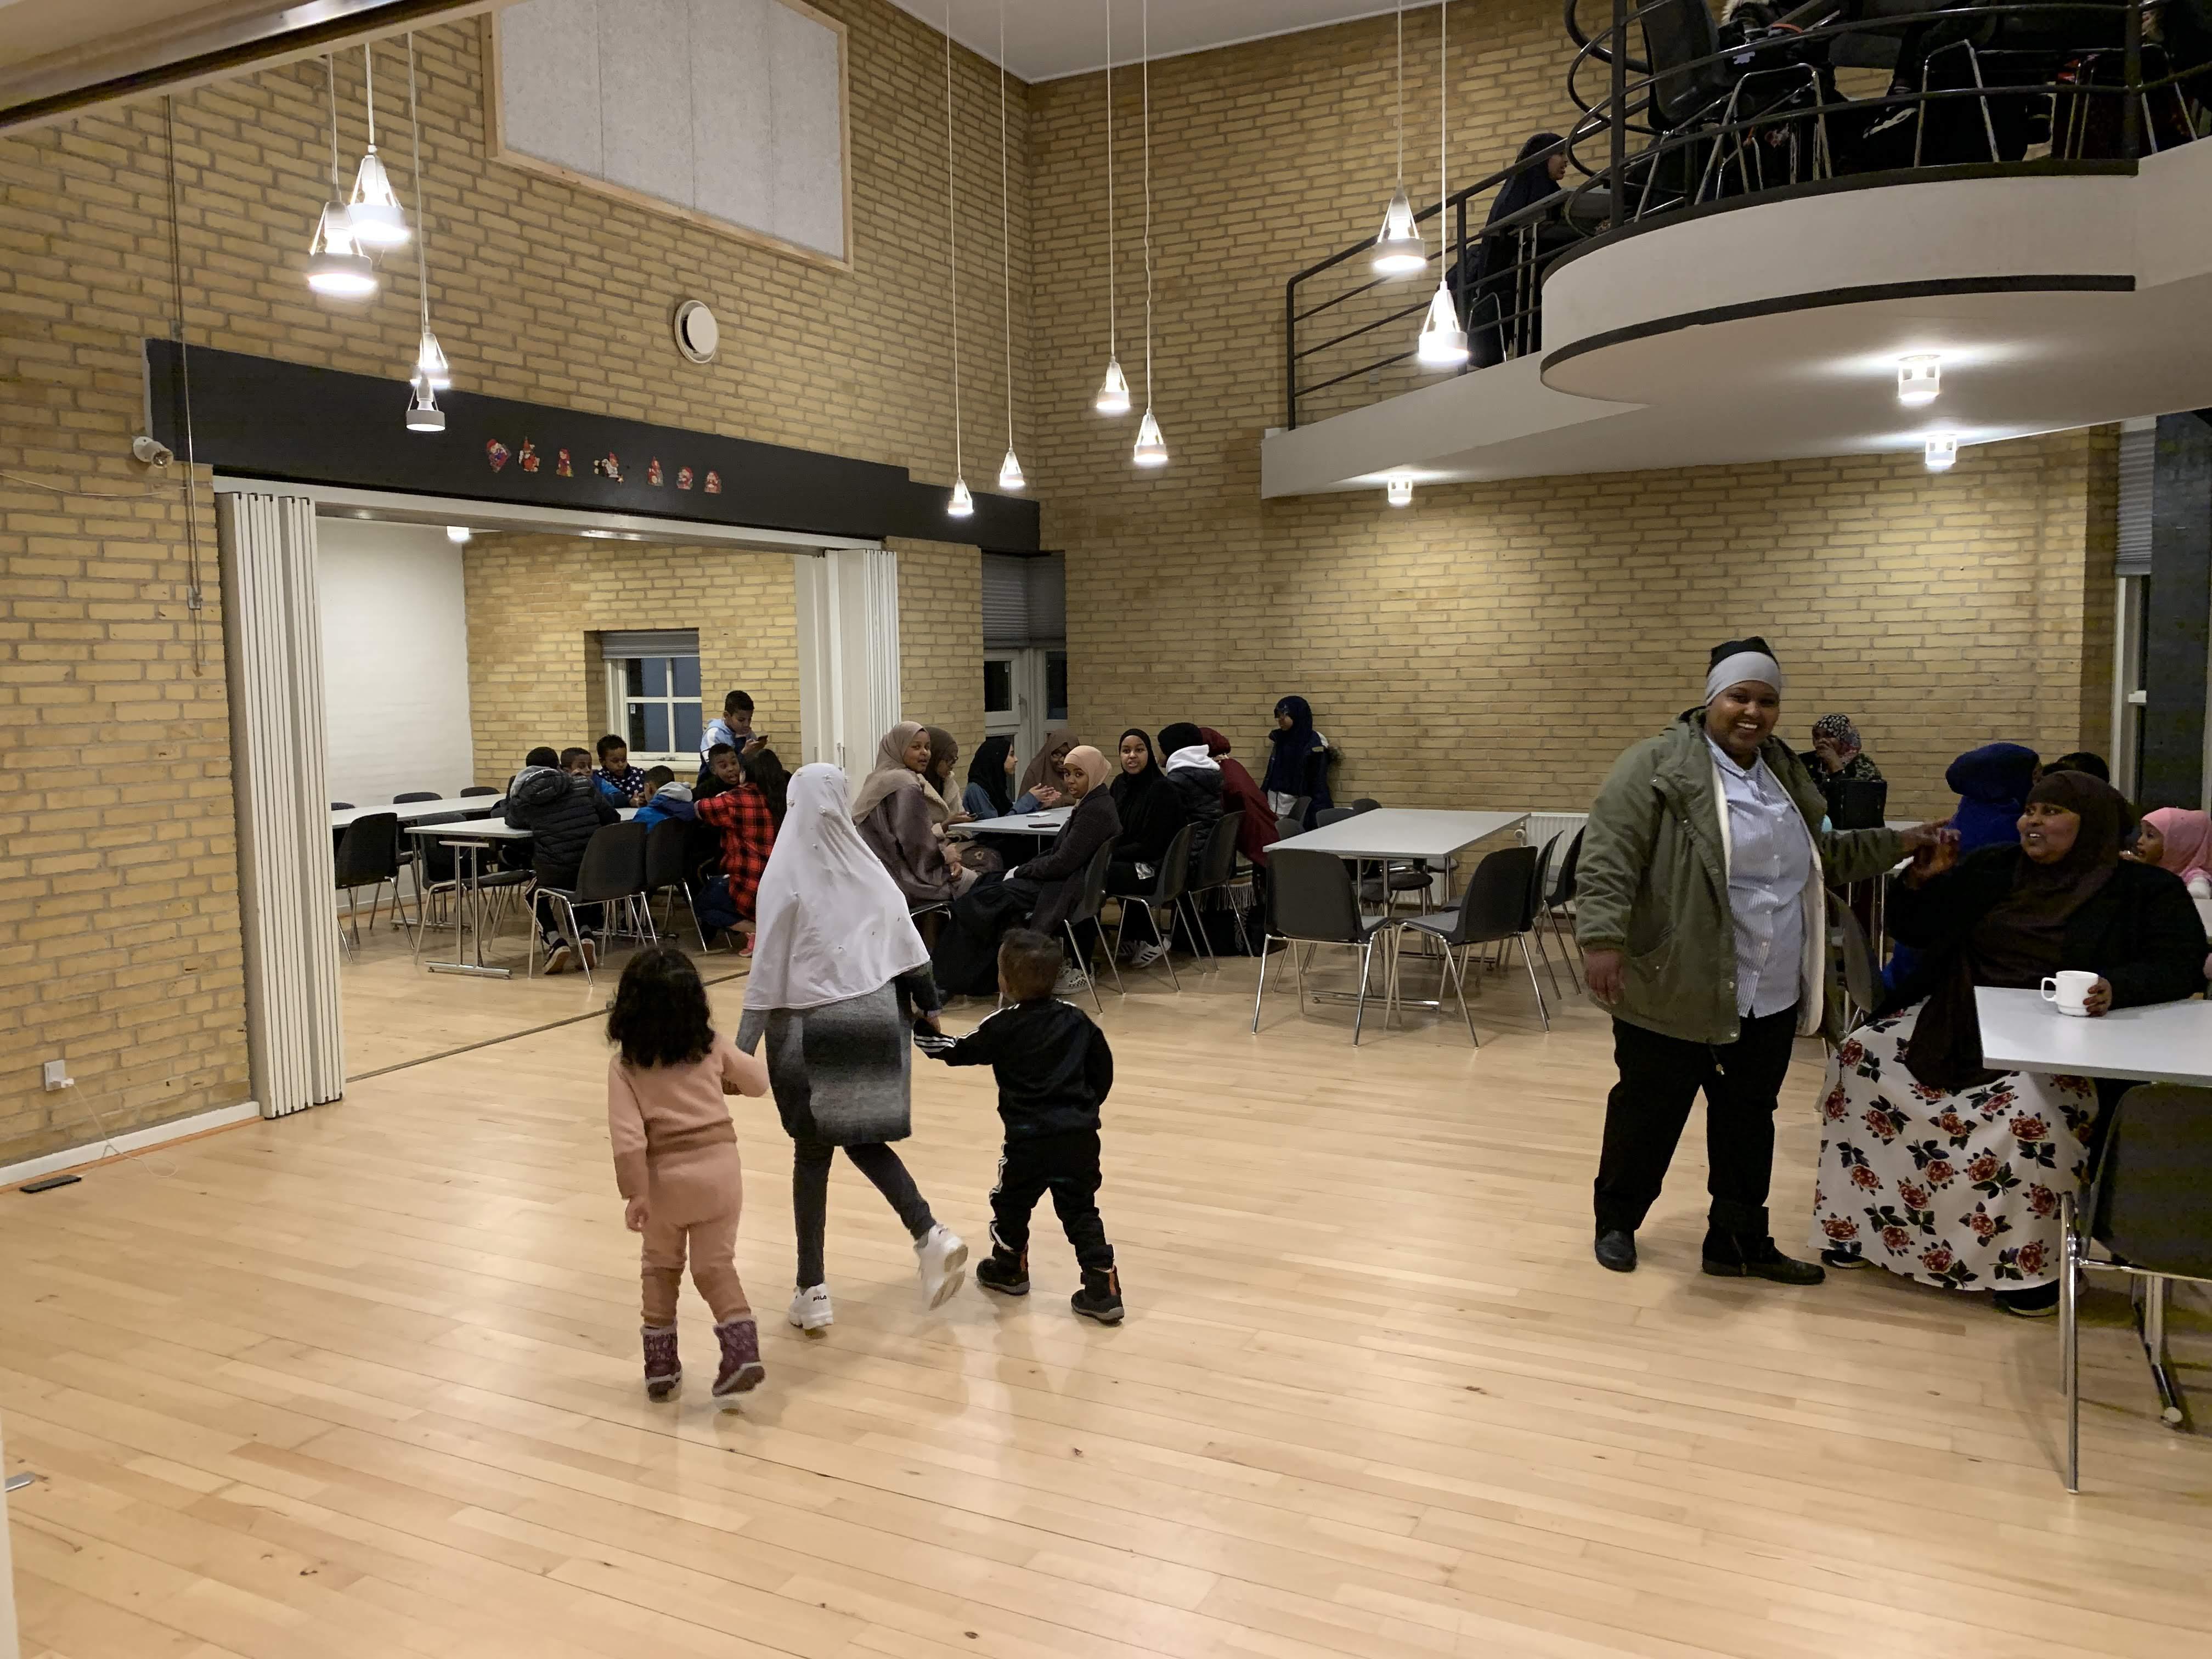 fællesspisning-den-28-12-2019-i-beboerhuset-på-Ellekonebakken-008